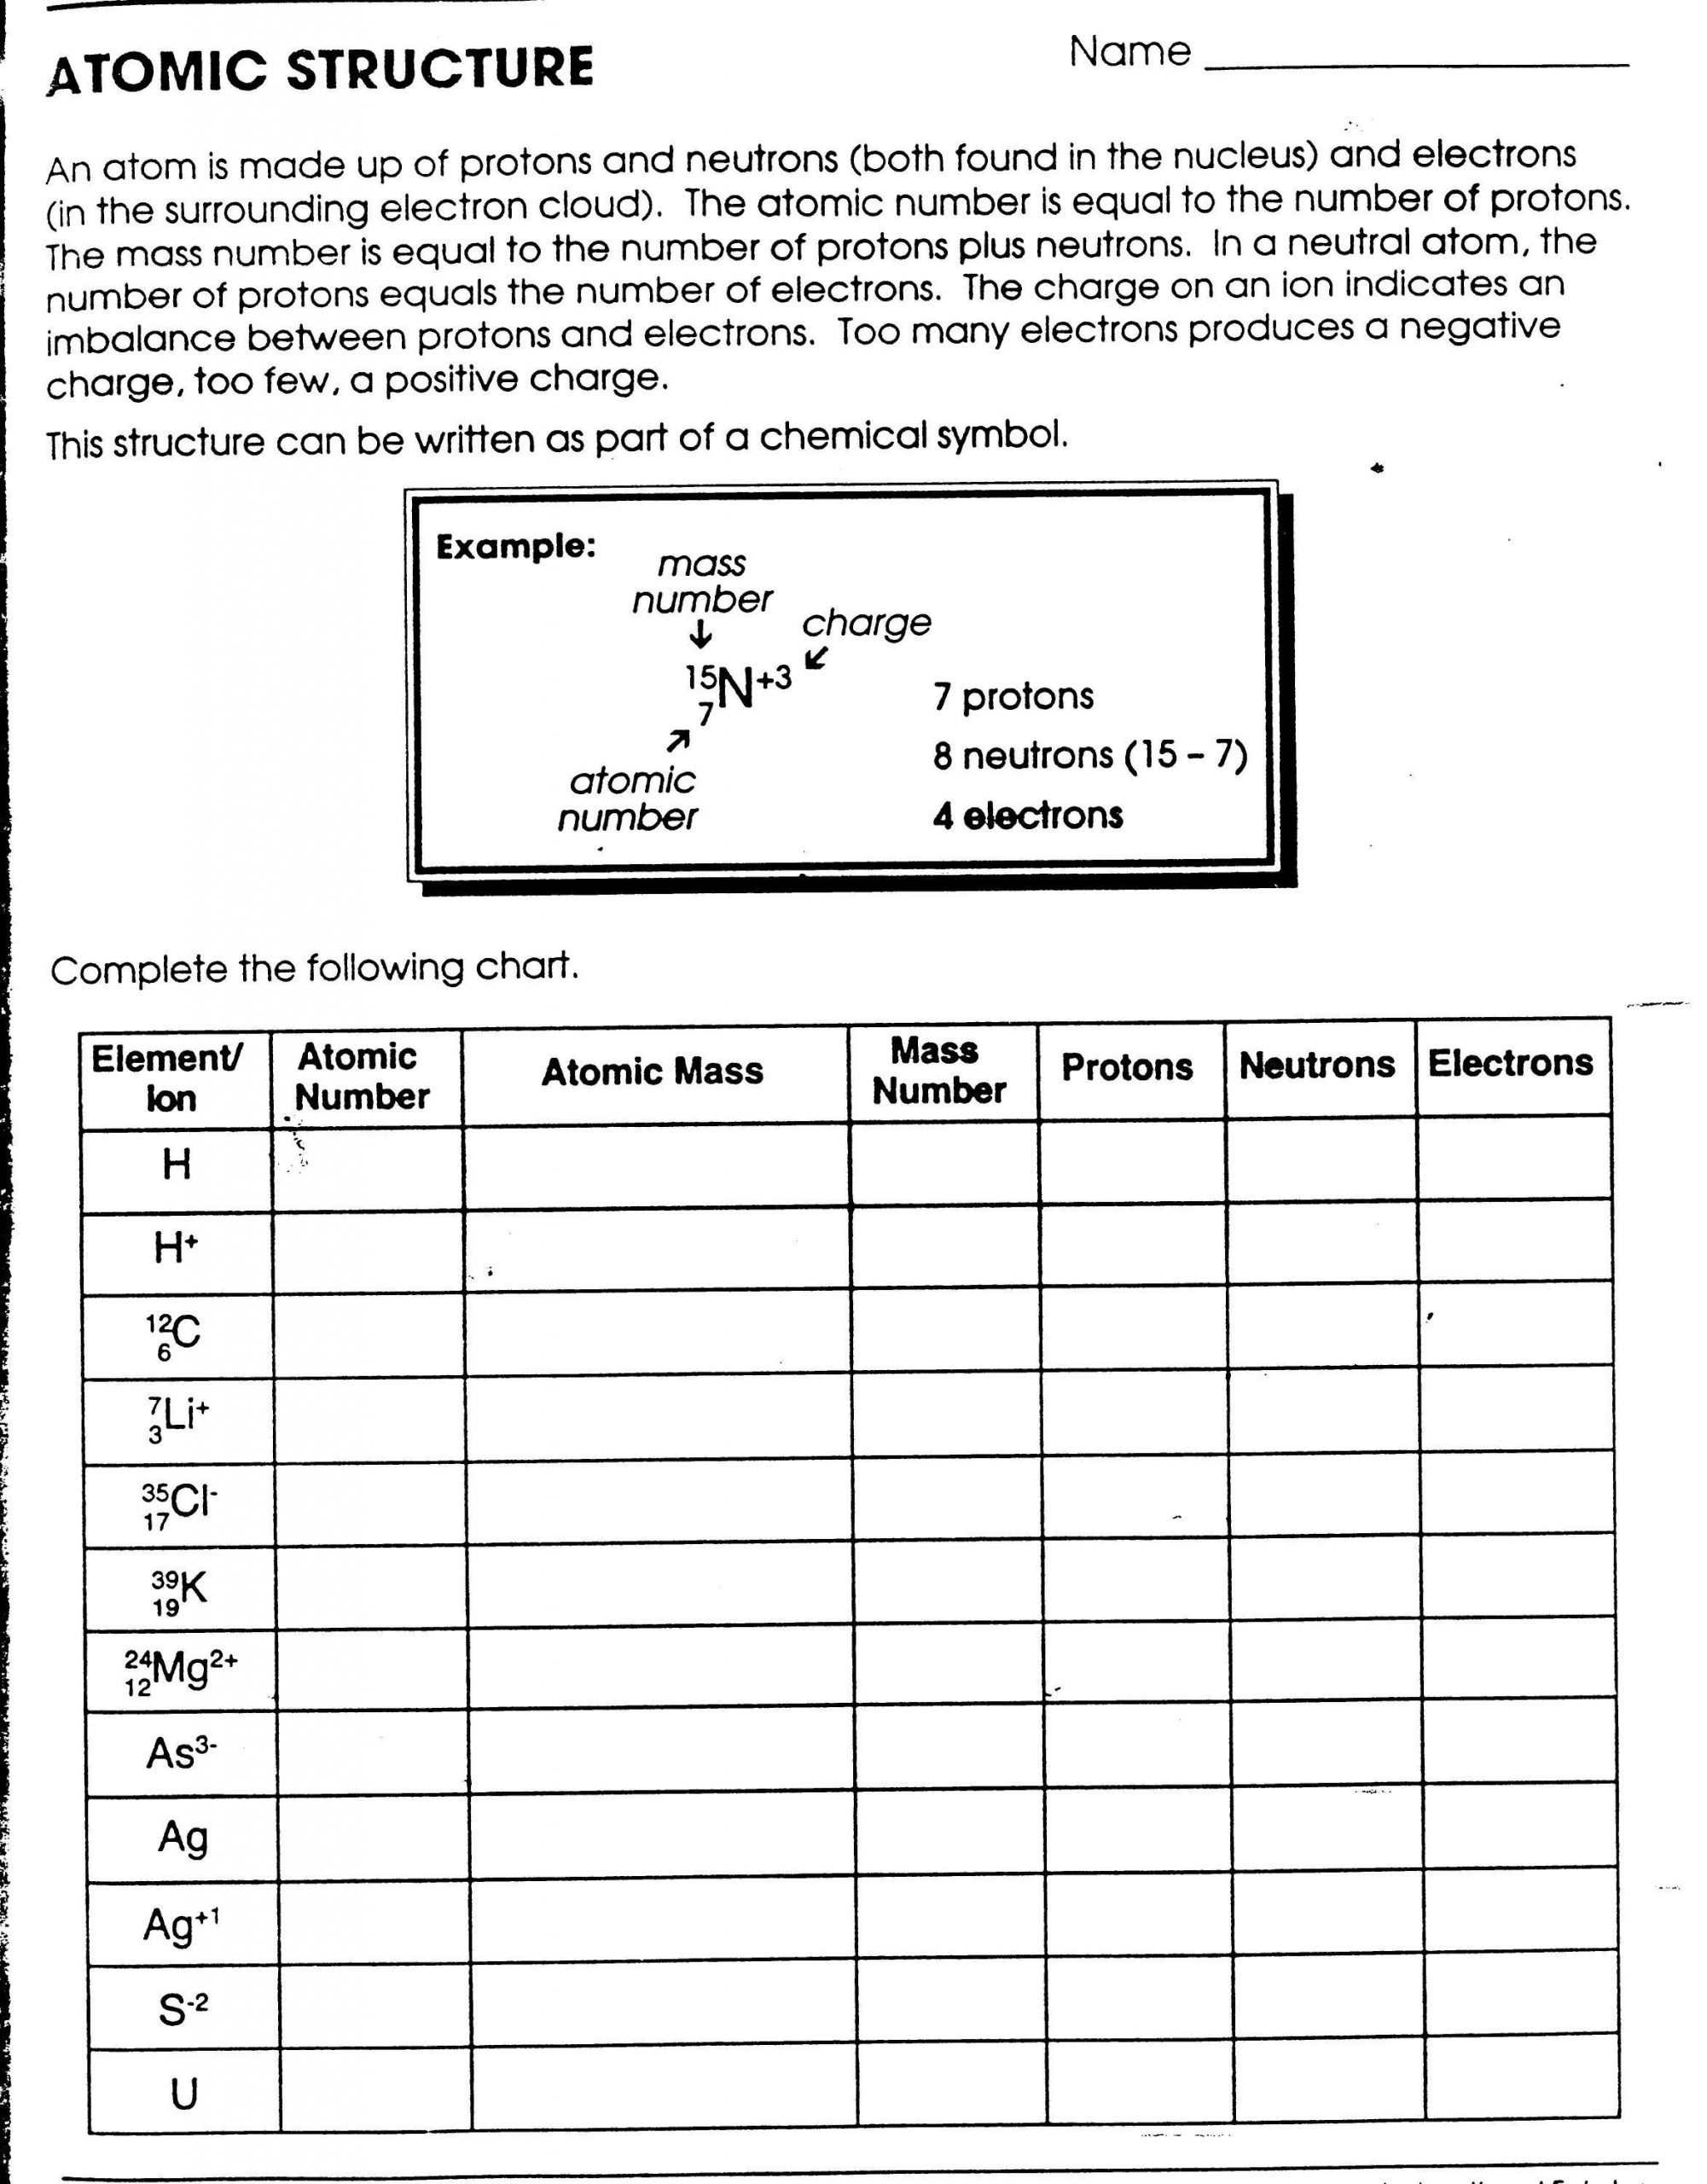 Atomic Structure Worksheet Pdf Printables atomic Structure Worksheet Gozoneguide